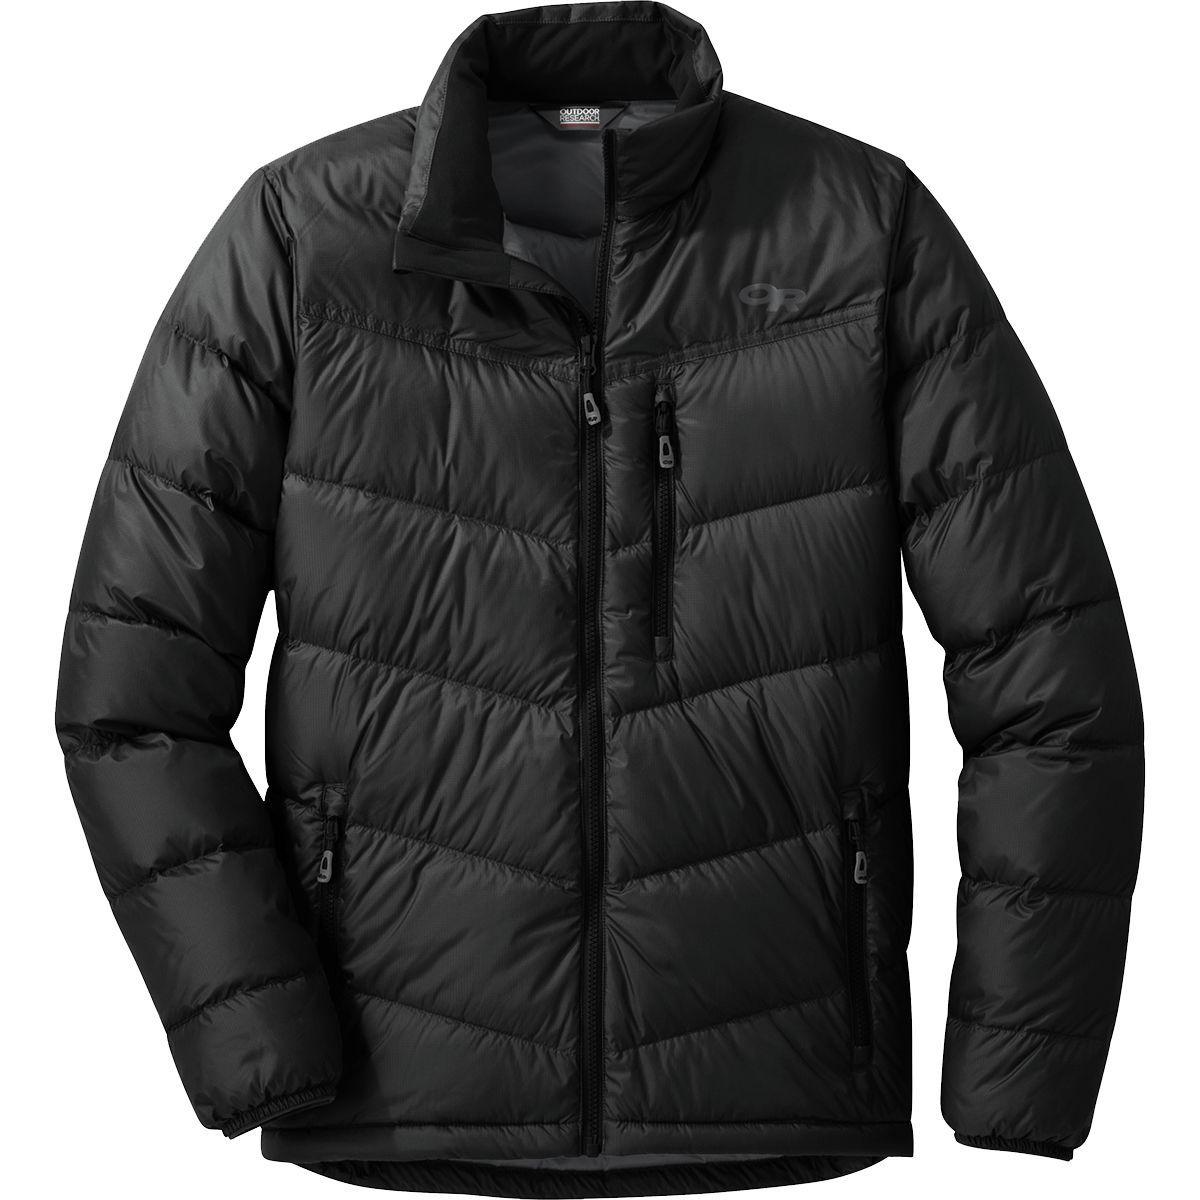 Outdoor Research Transcendent Down Jacket Men's